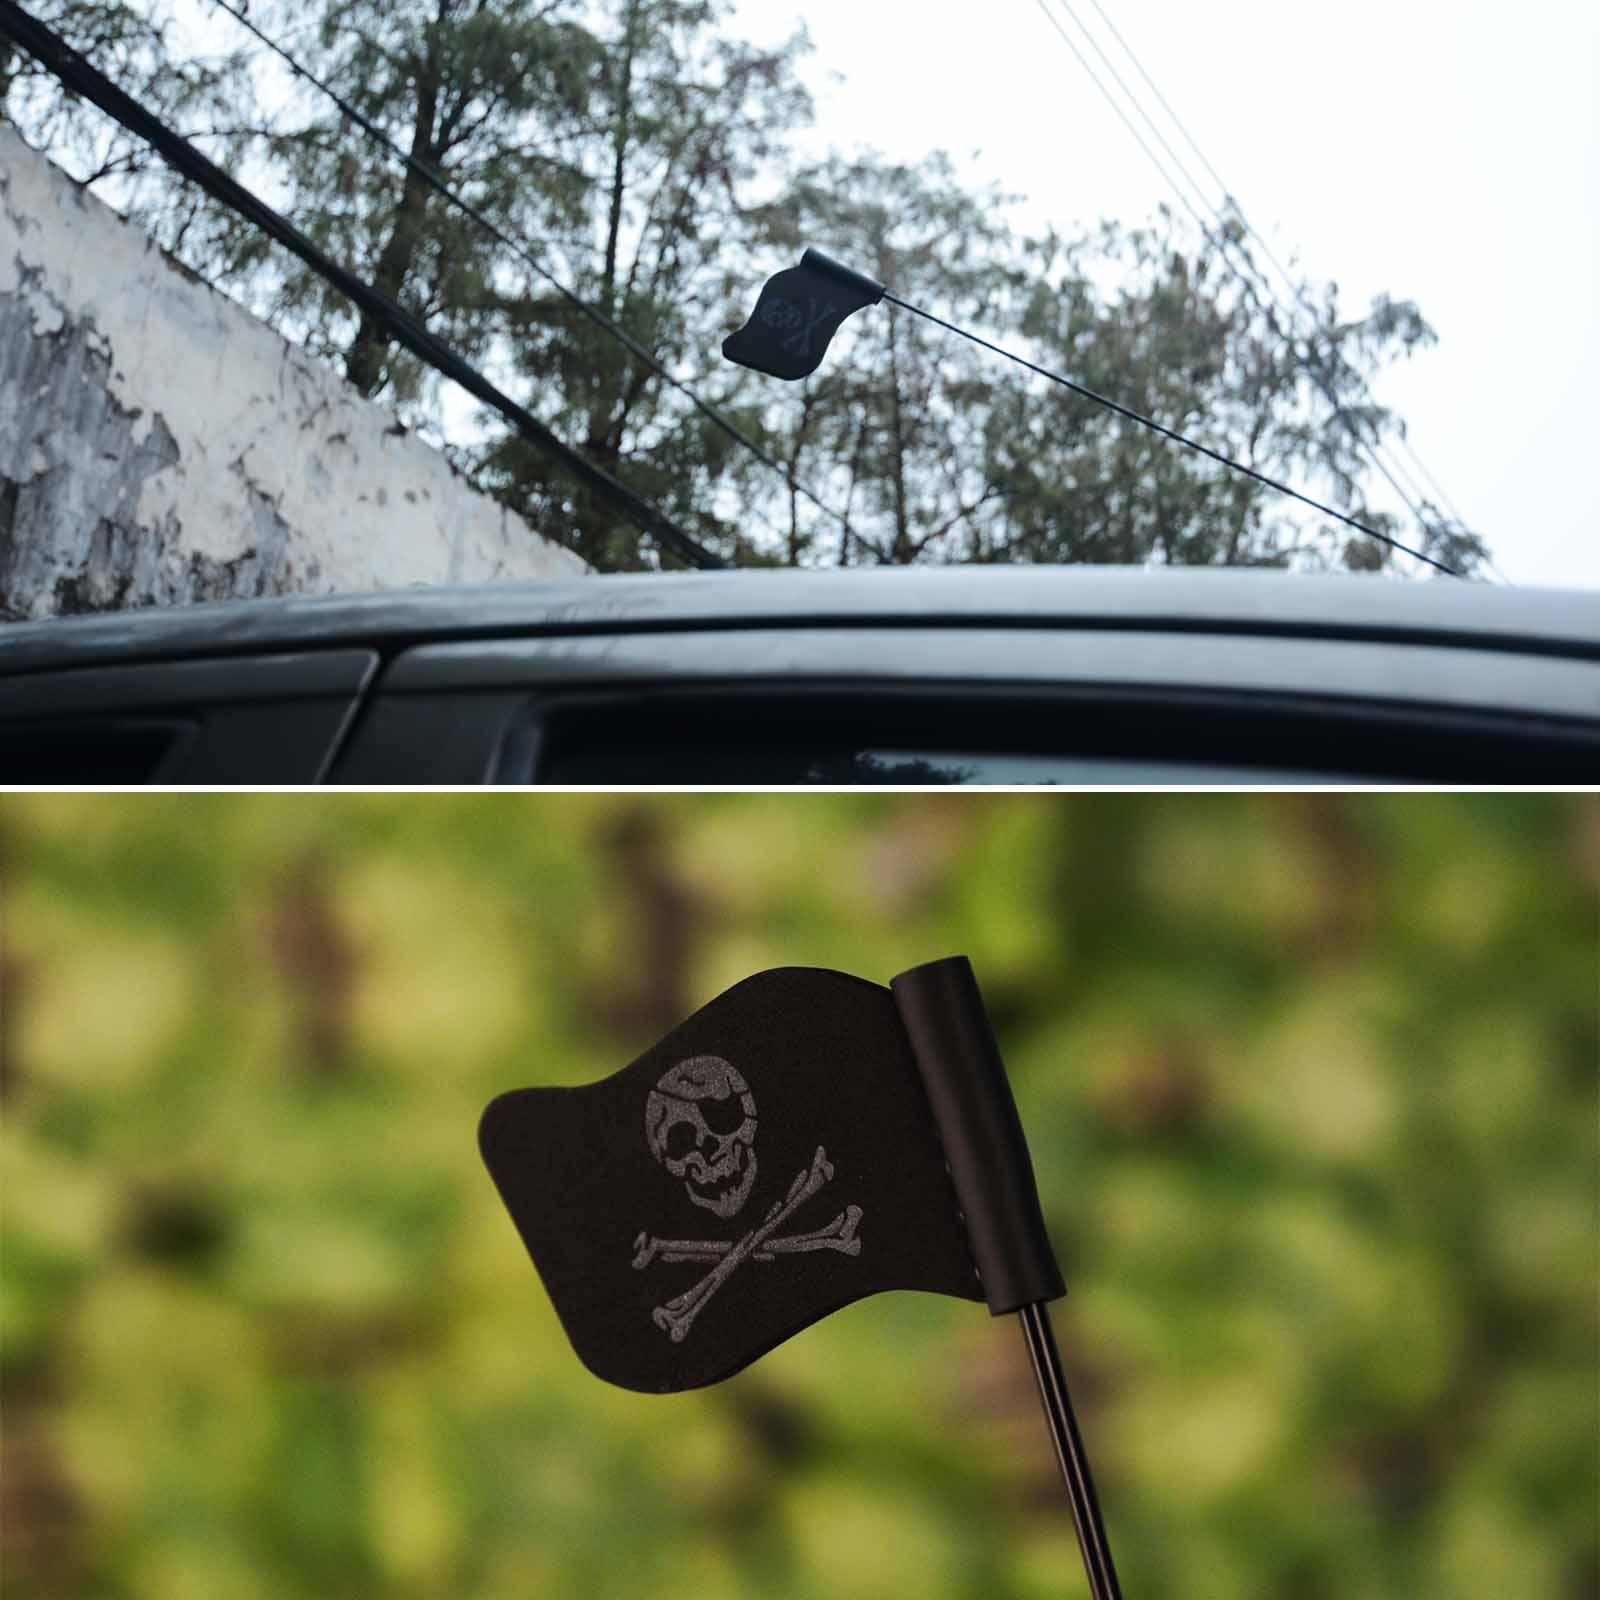 De Goedkoopste Prijs 1 St Zwart Jolly Roger Piraat Vlag Auto Antenne Pen Topper Antenne Bal Decor Speelgoed Leuke Anttenna Dak Decoratieve Accessoires 2019 Nieuwste Stijl Online Verkoop 50%